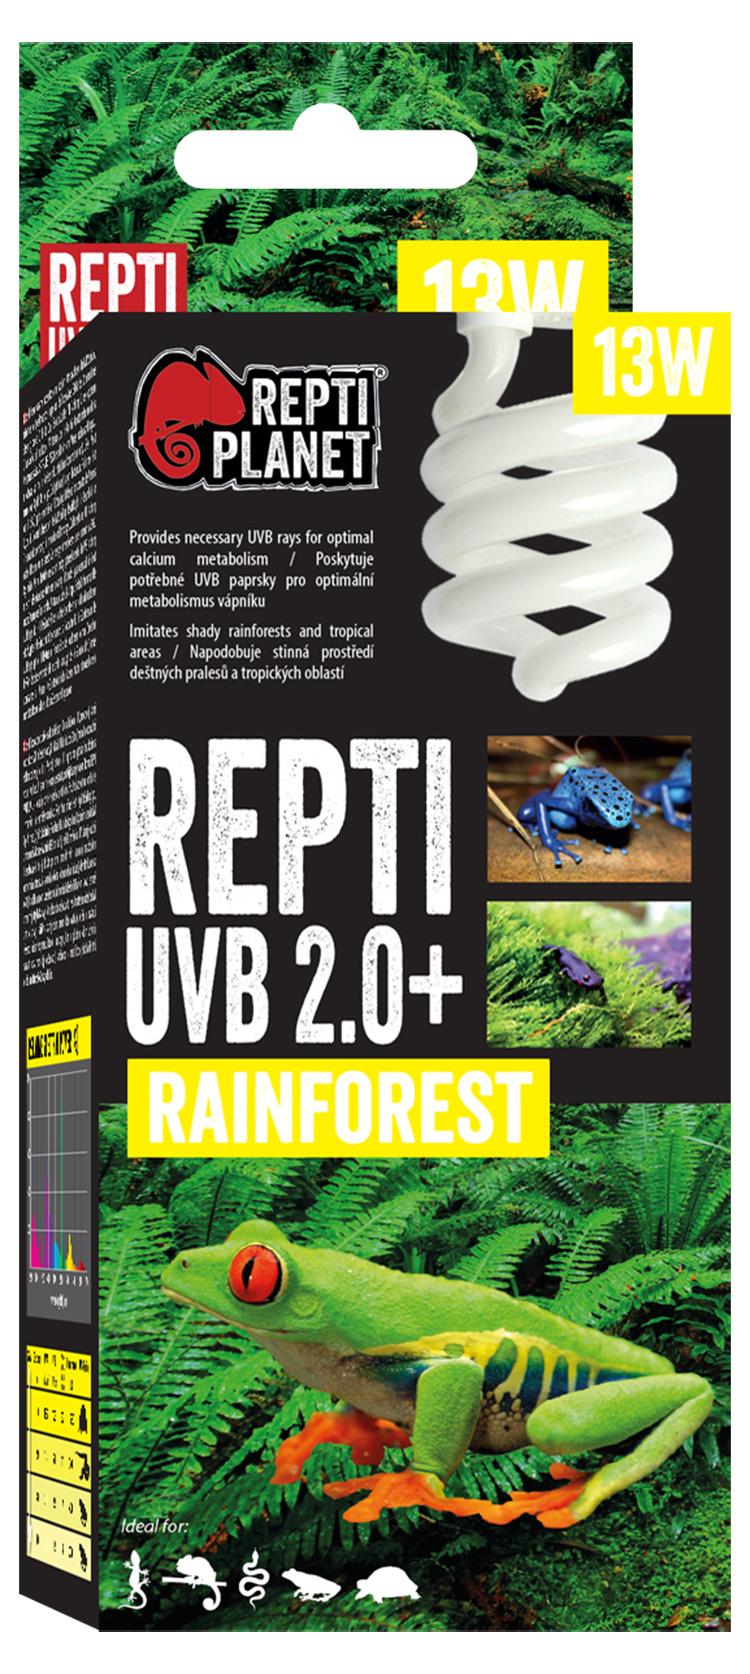 Spuldze terārija lampai - ReptiPlanet Repti UVB 2.0, 13W